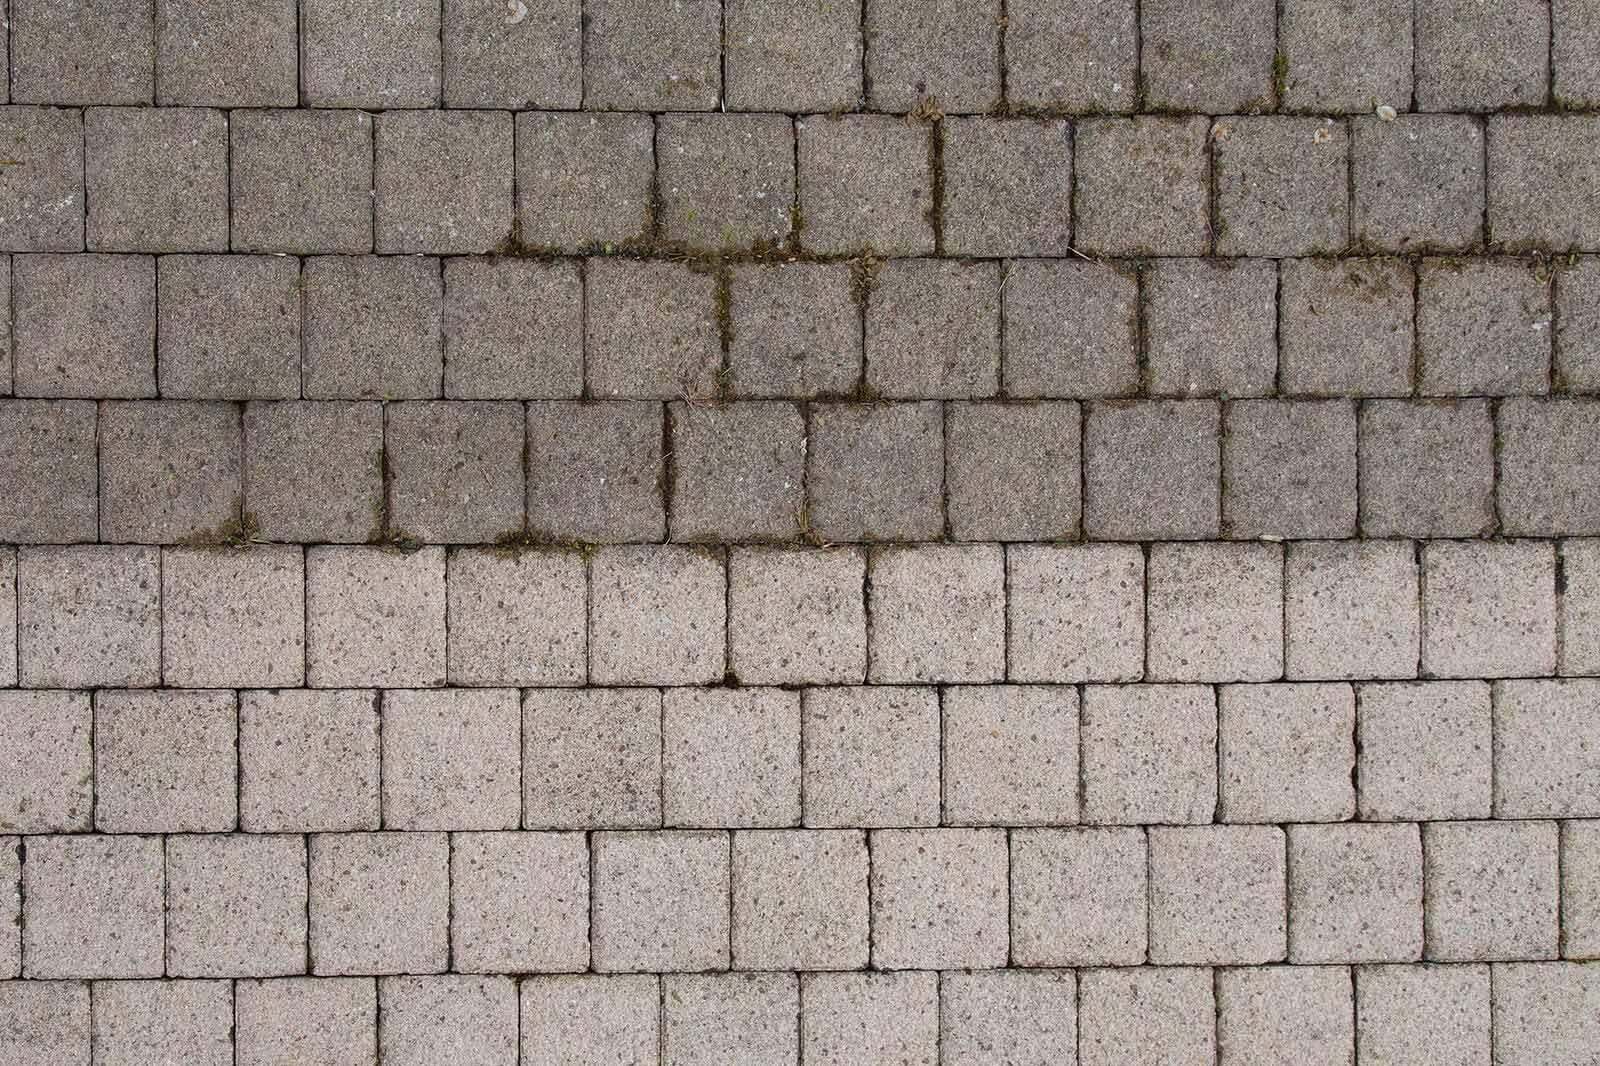 How to Clean Bricks and Masonry